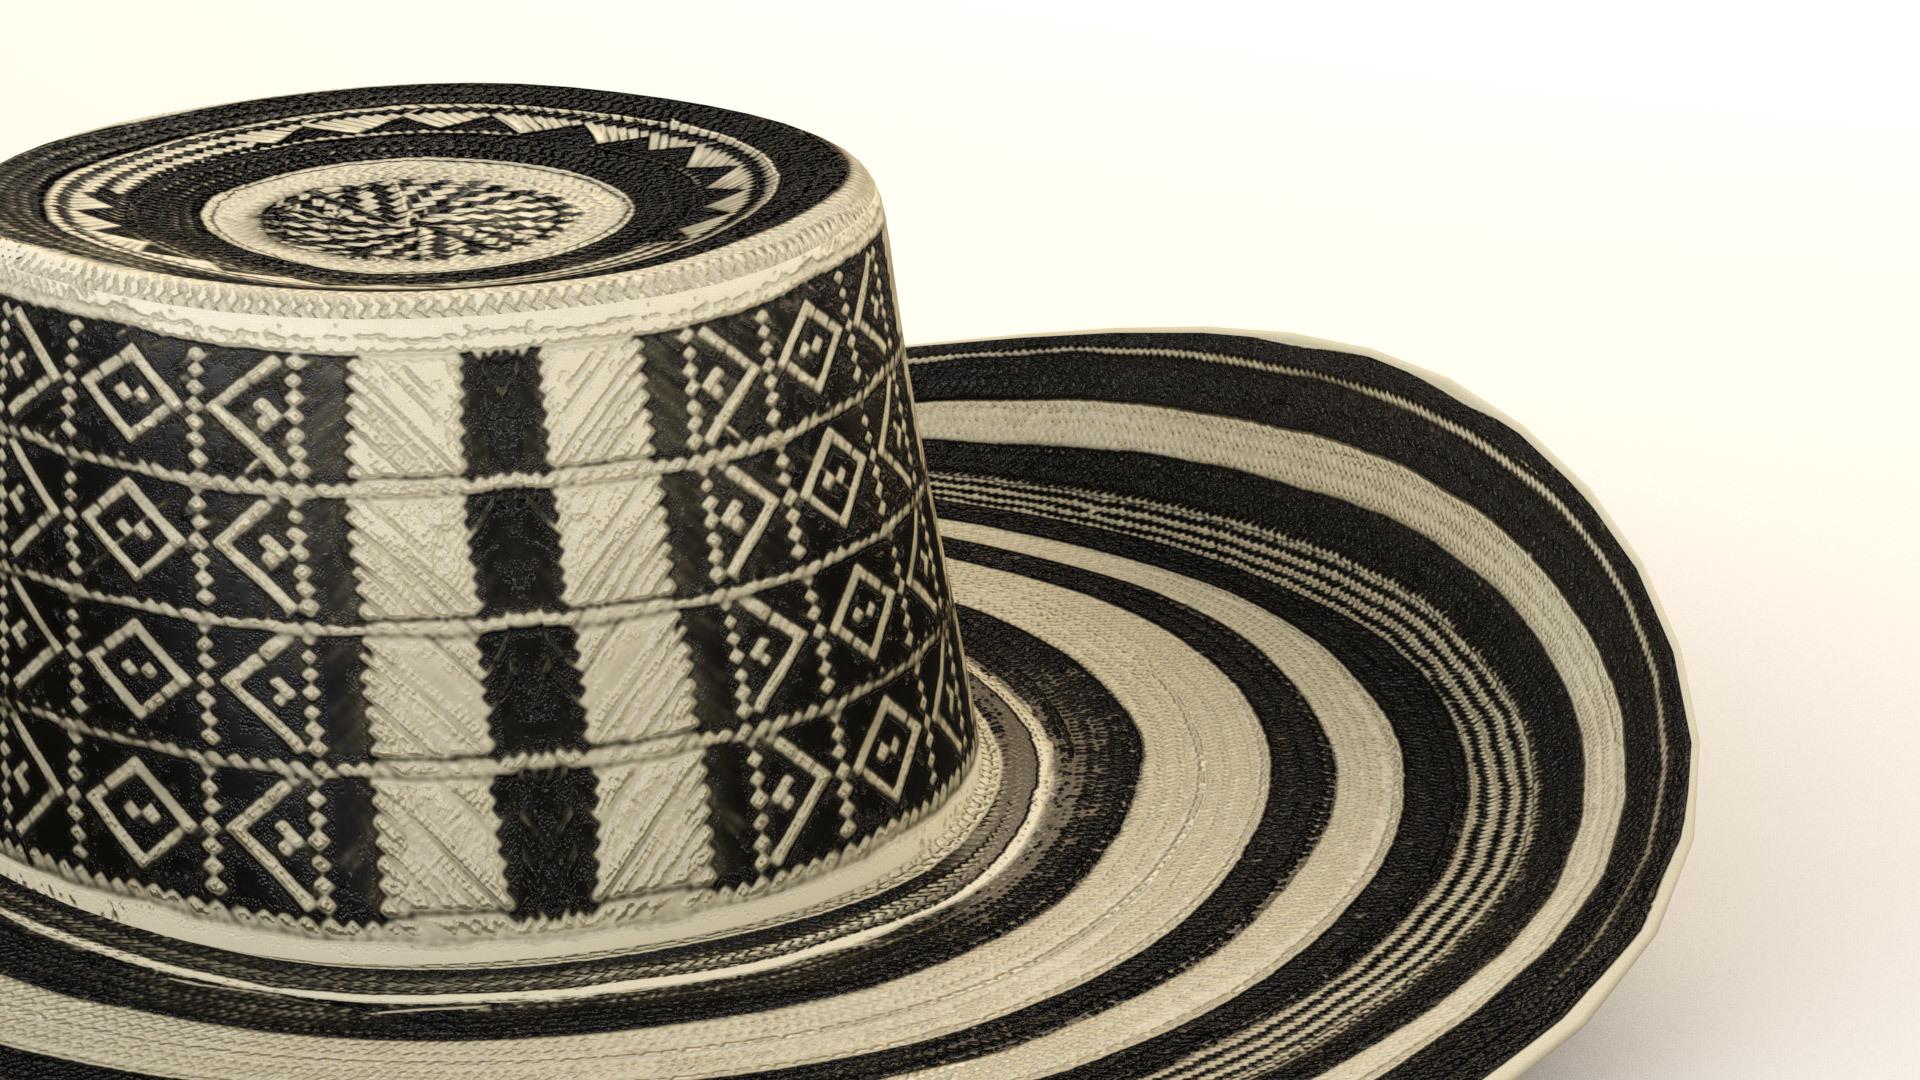 d1d3e808876 Hat Colombia Sombrero Vueltiao - Columbia - 3DOcean Item for Sale ·  hat bottom.jpg ...